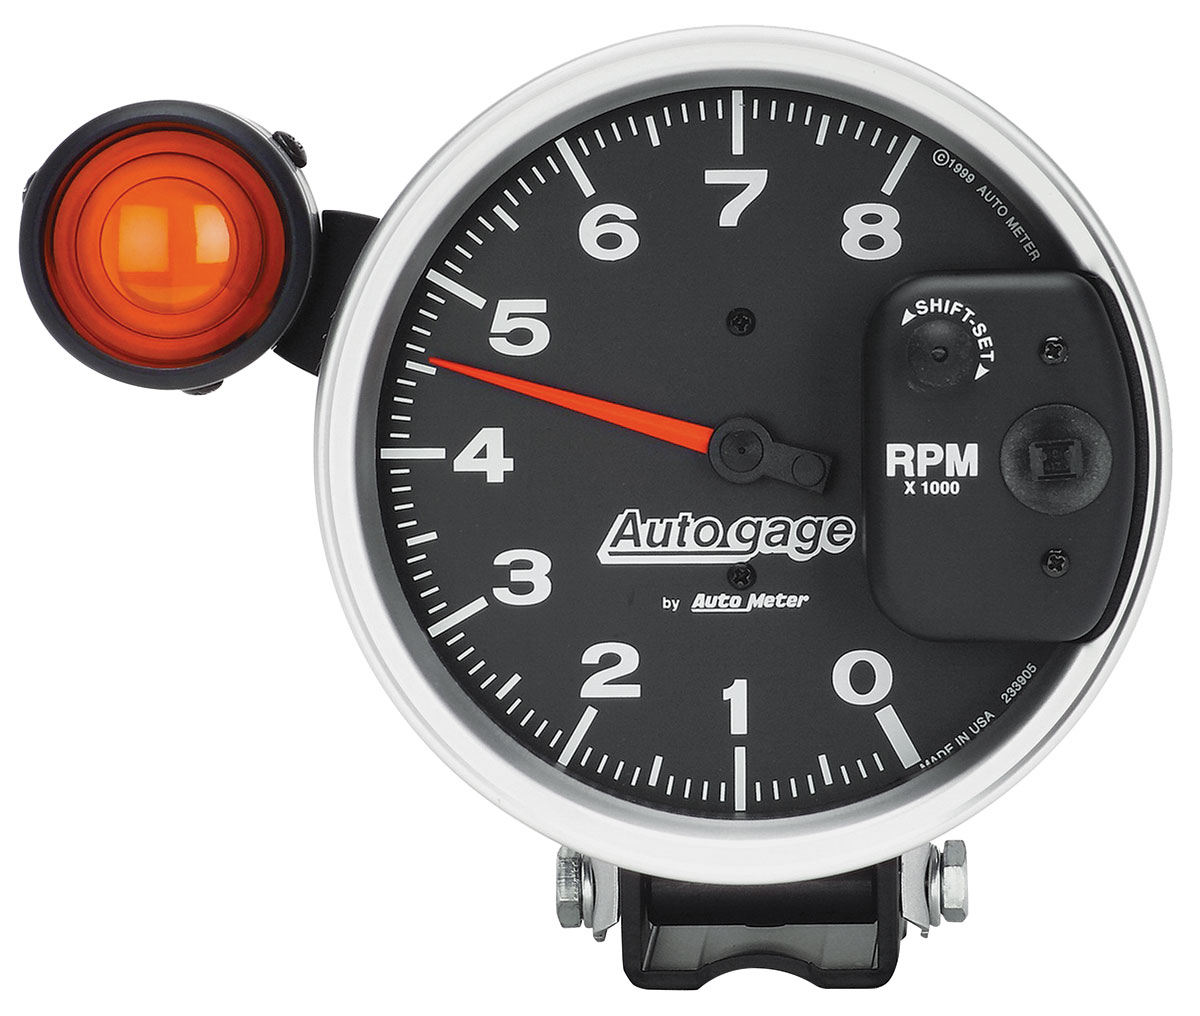 Gauge, Tachometer, Auto Meter, Auto Gage, 5